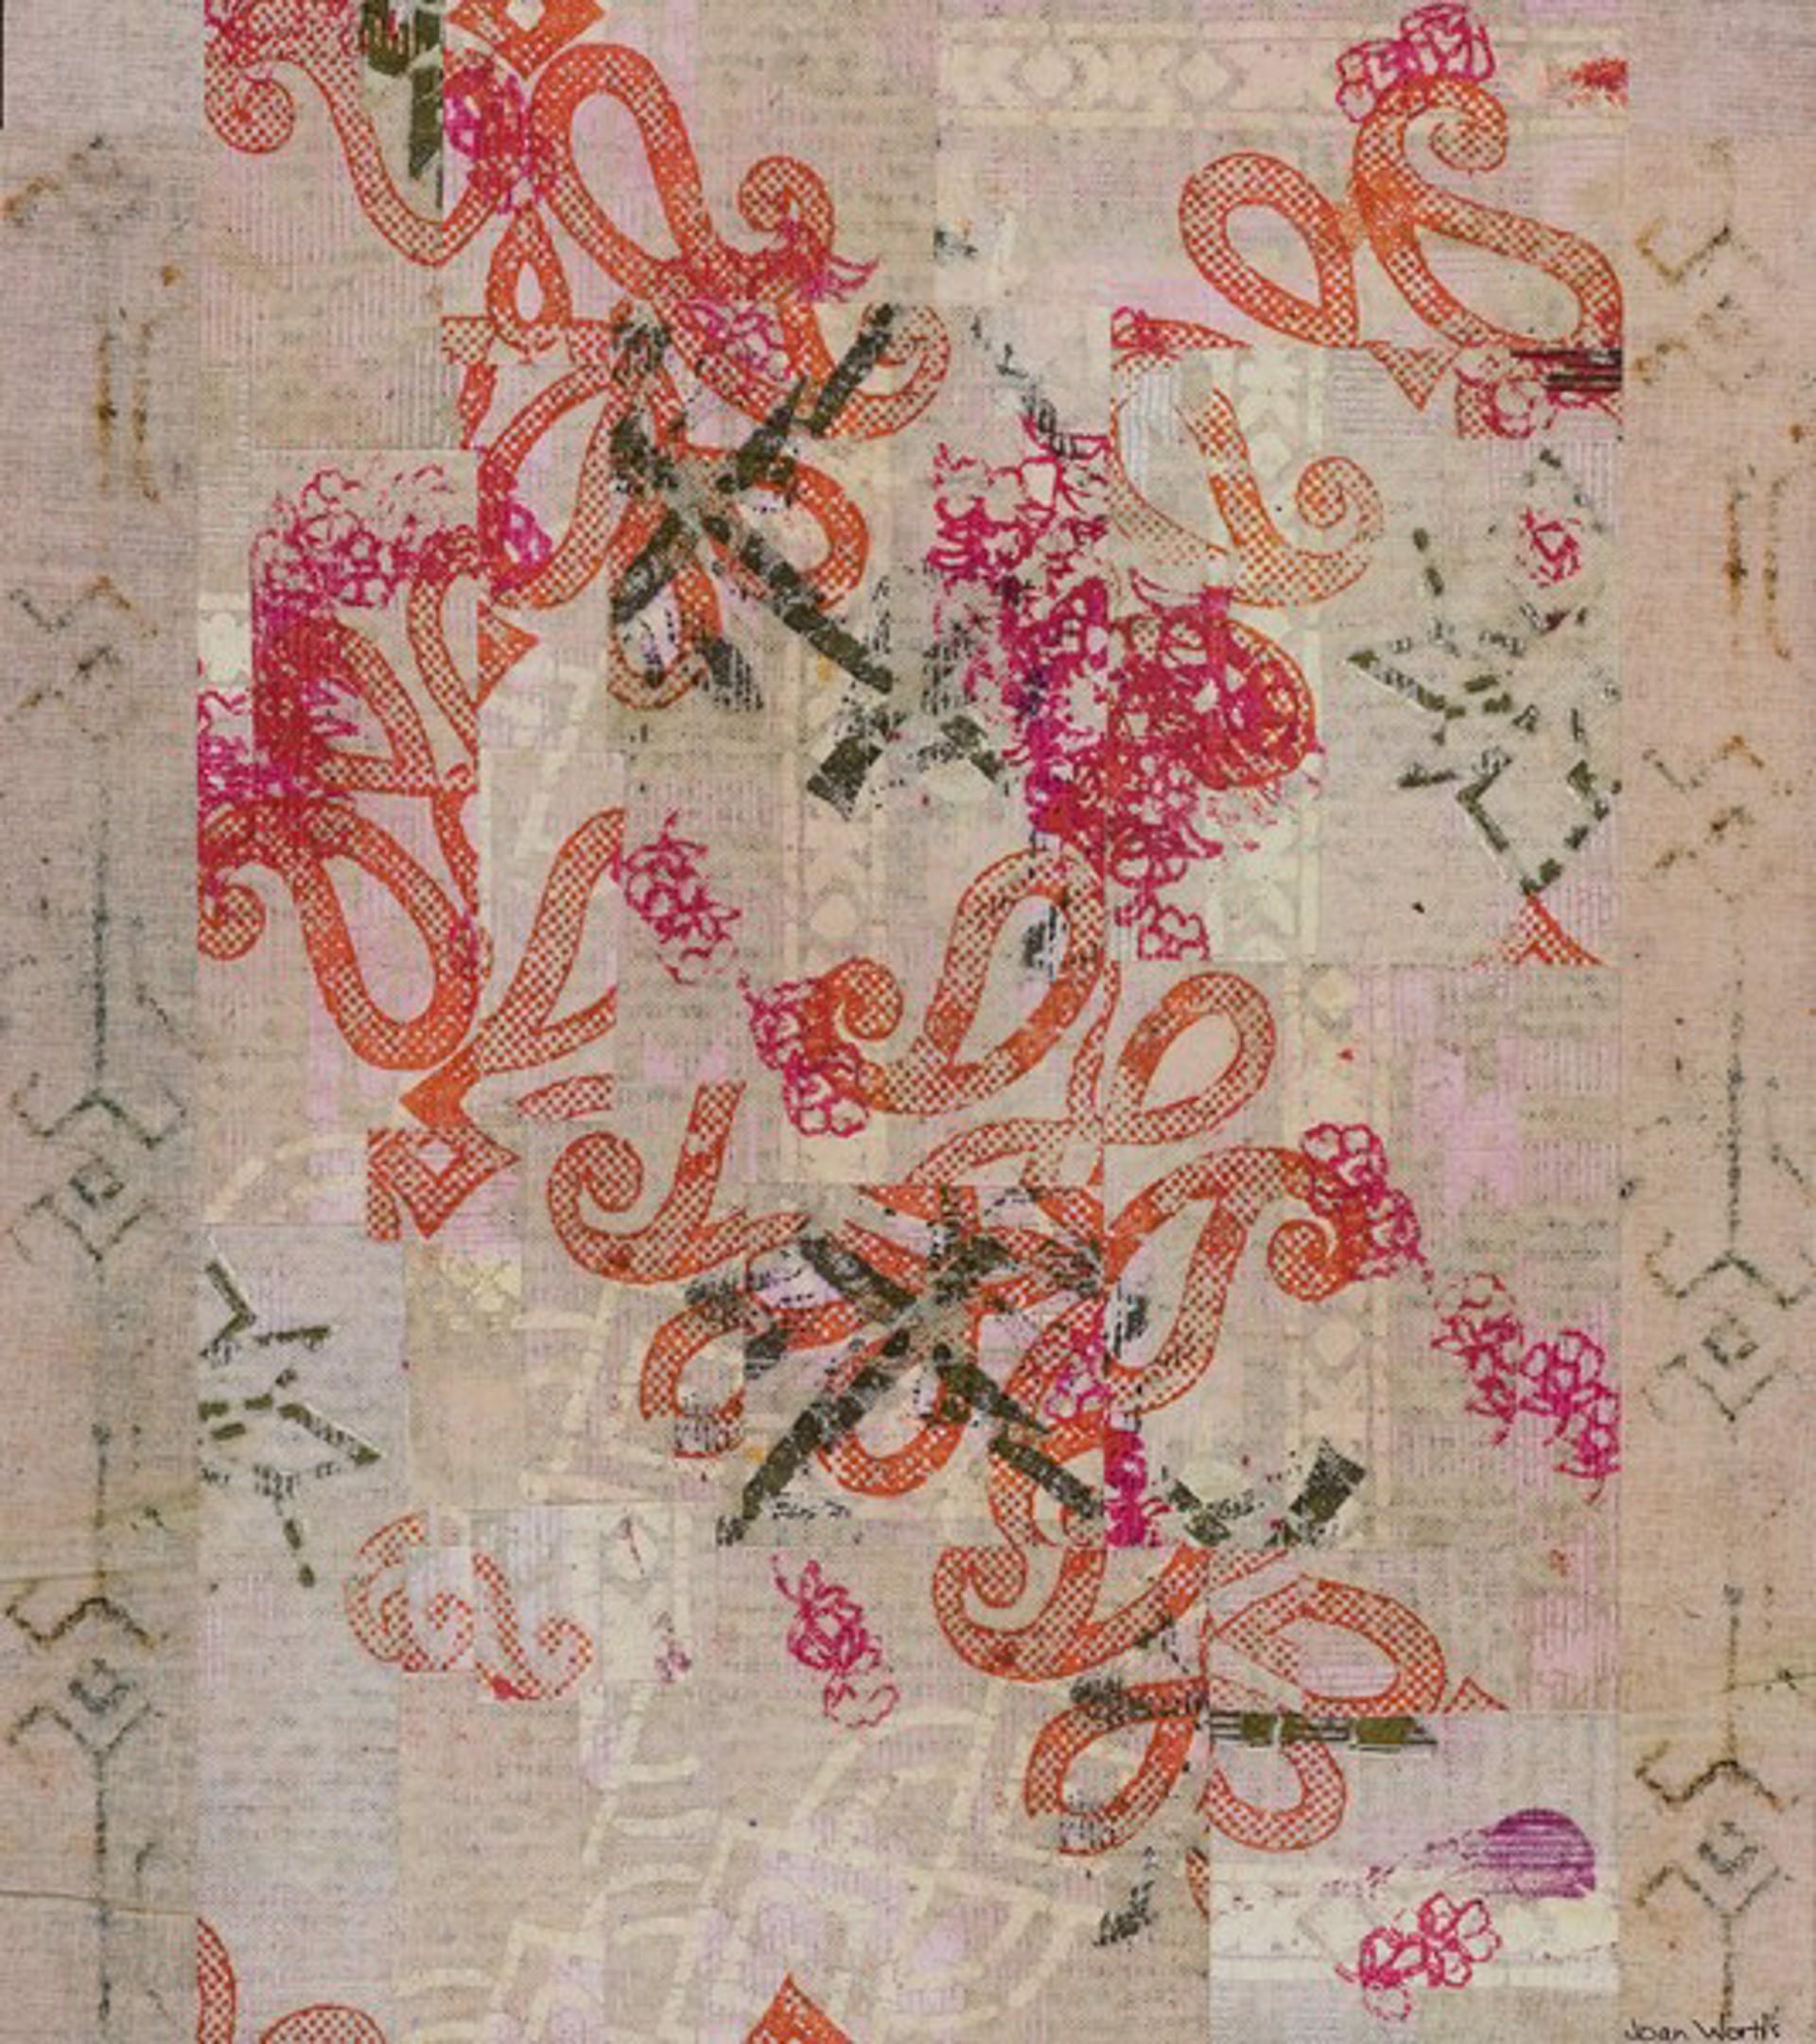 Dancing Patterns by Joan Wortis